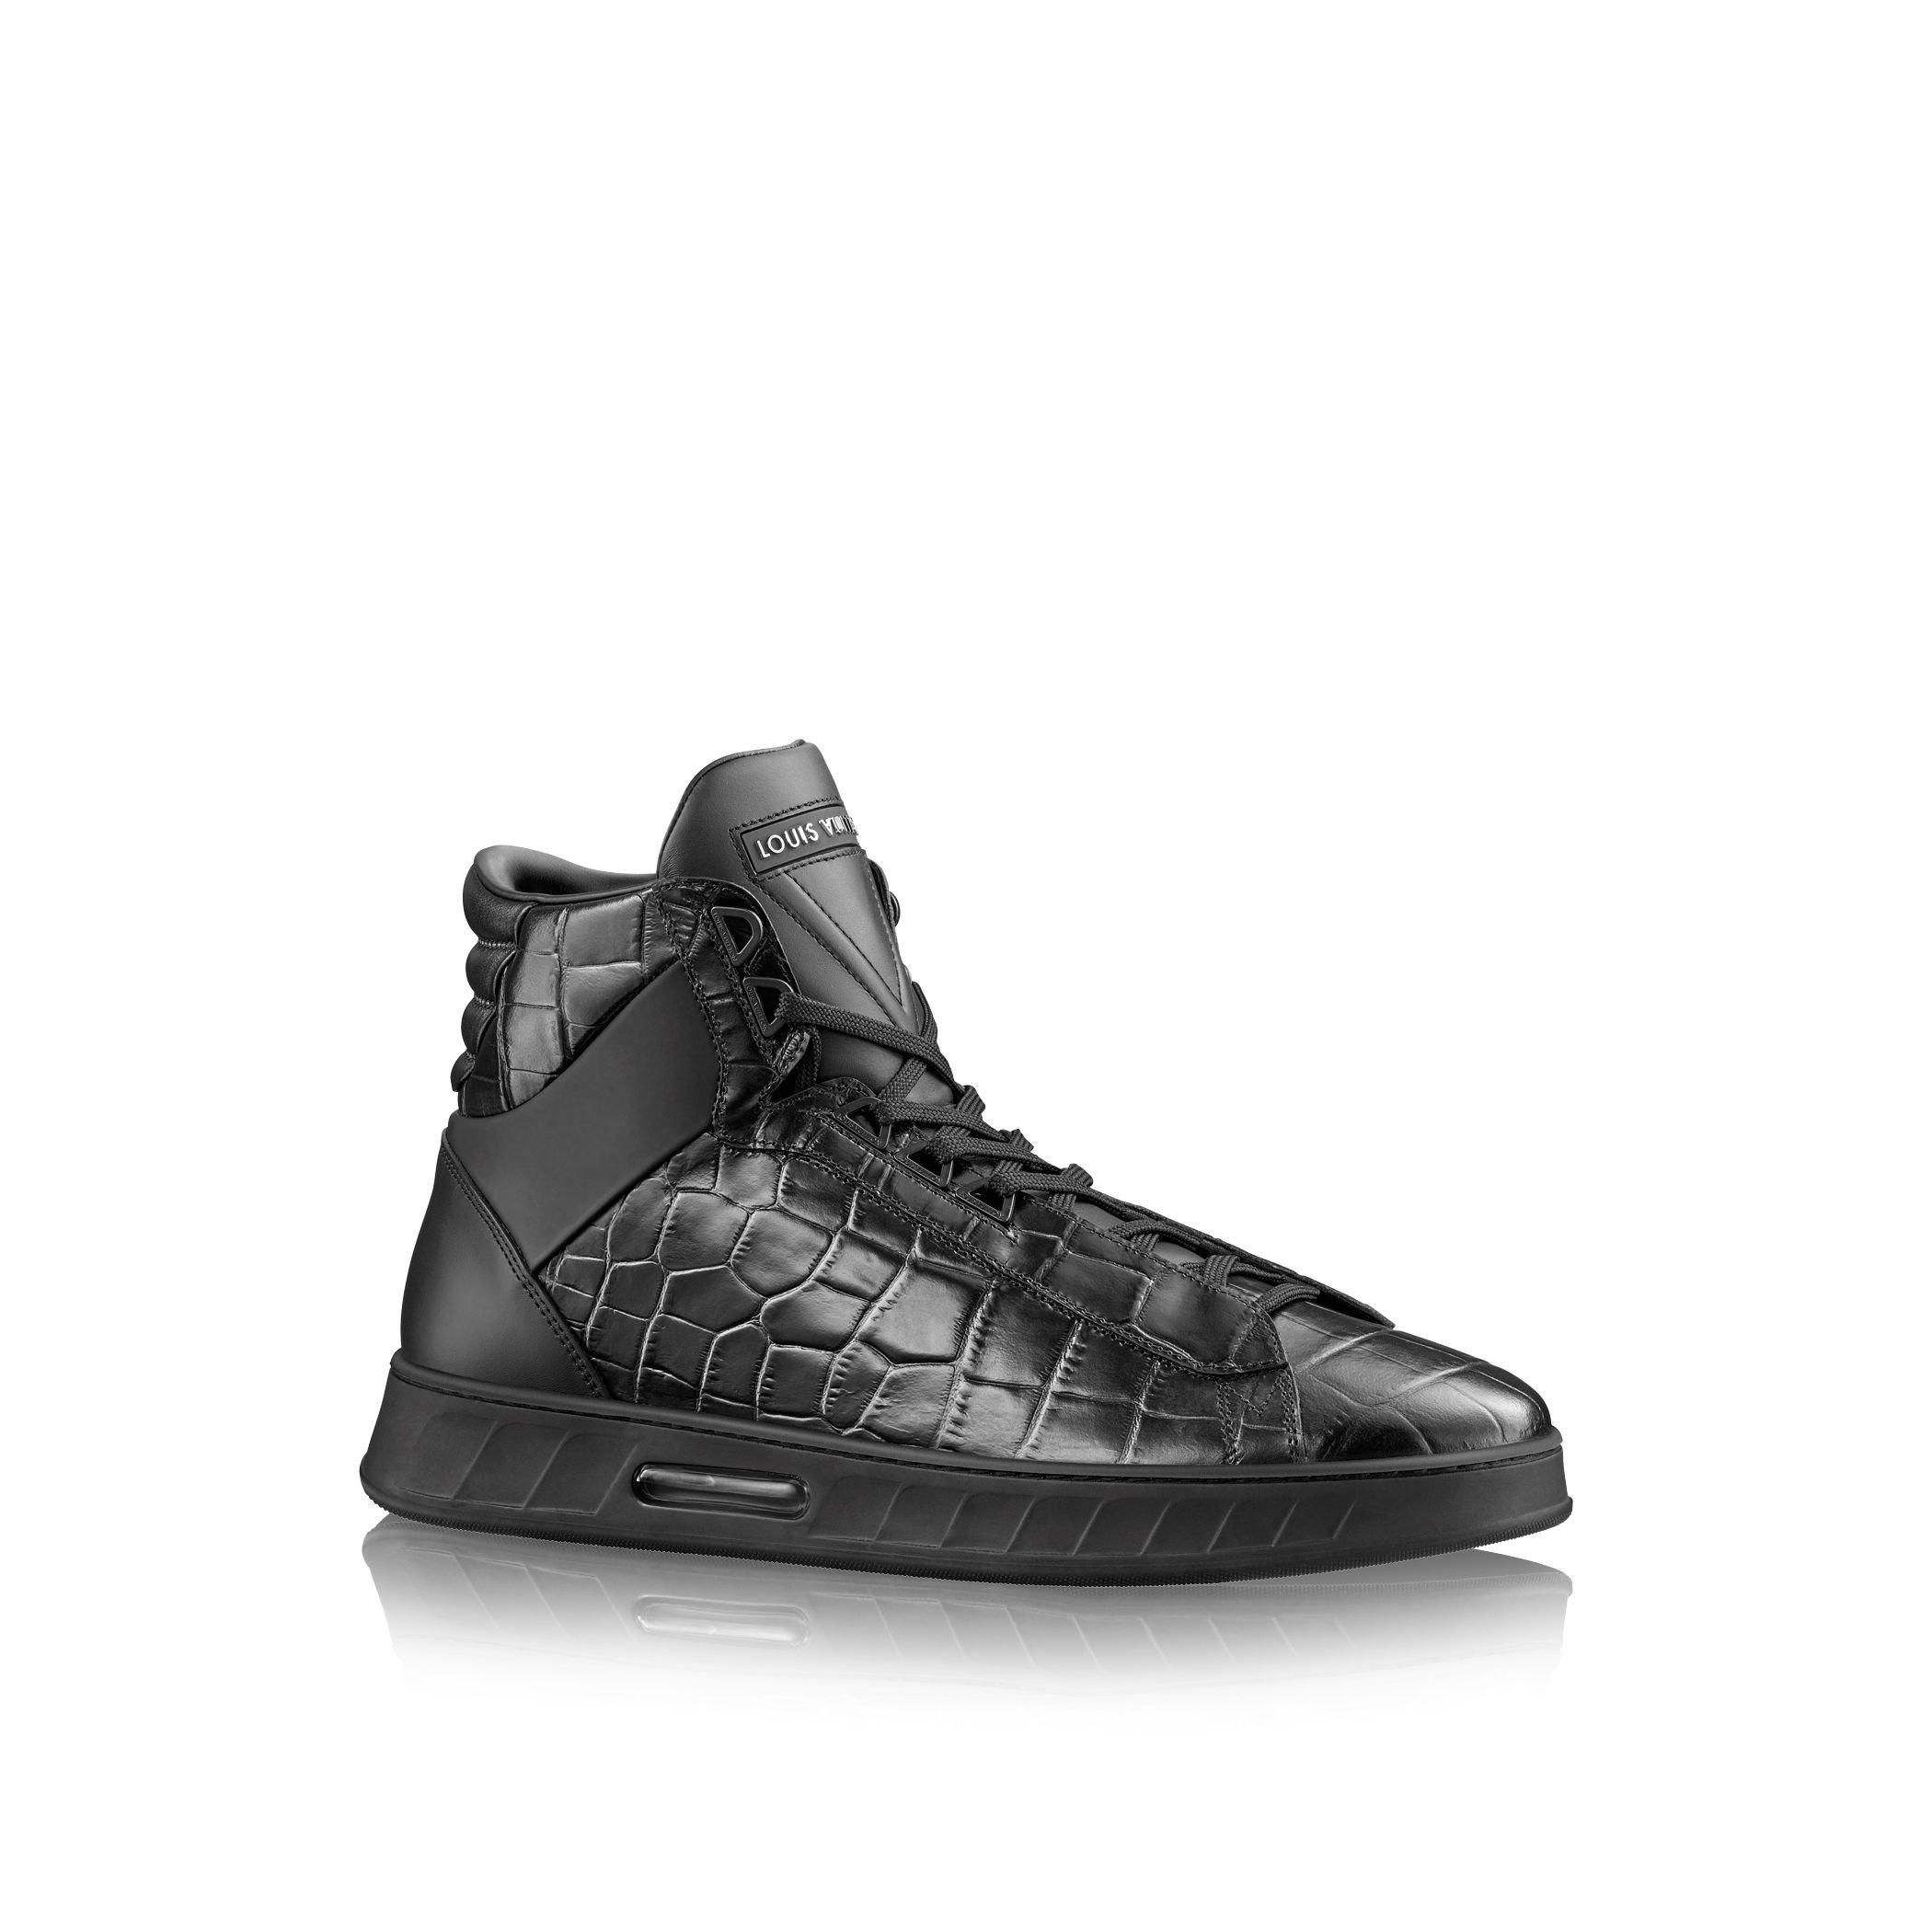 Louis vuitton Streetlight Sneaker Boot in Black for Men | Lyst